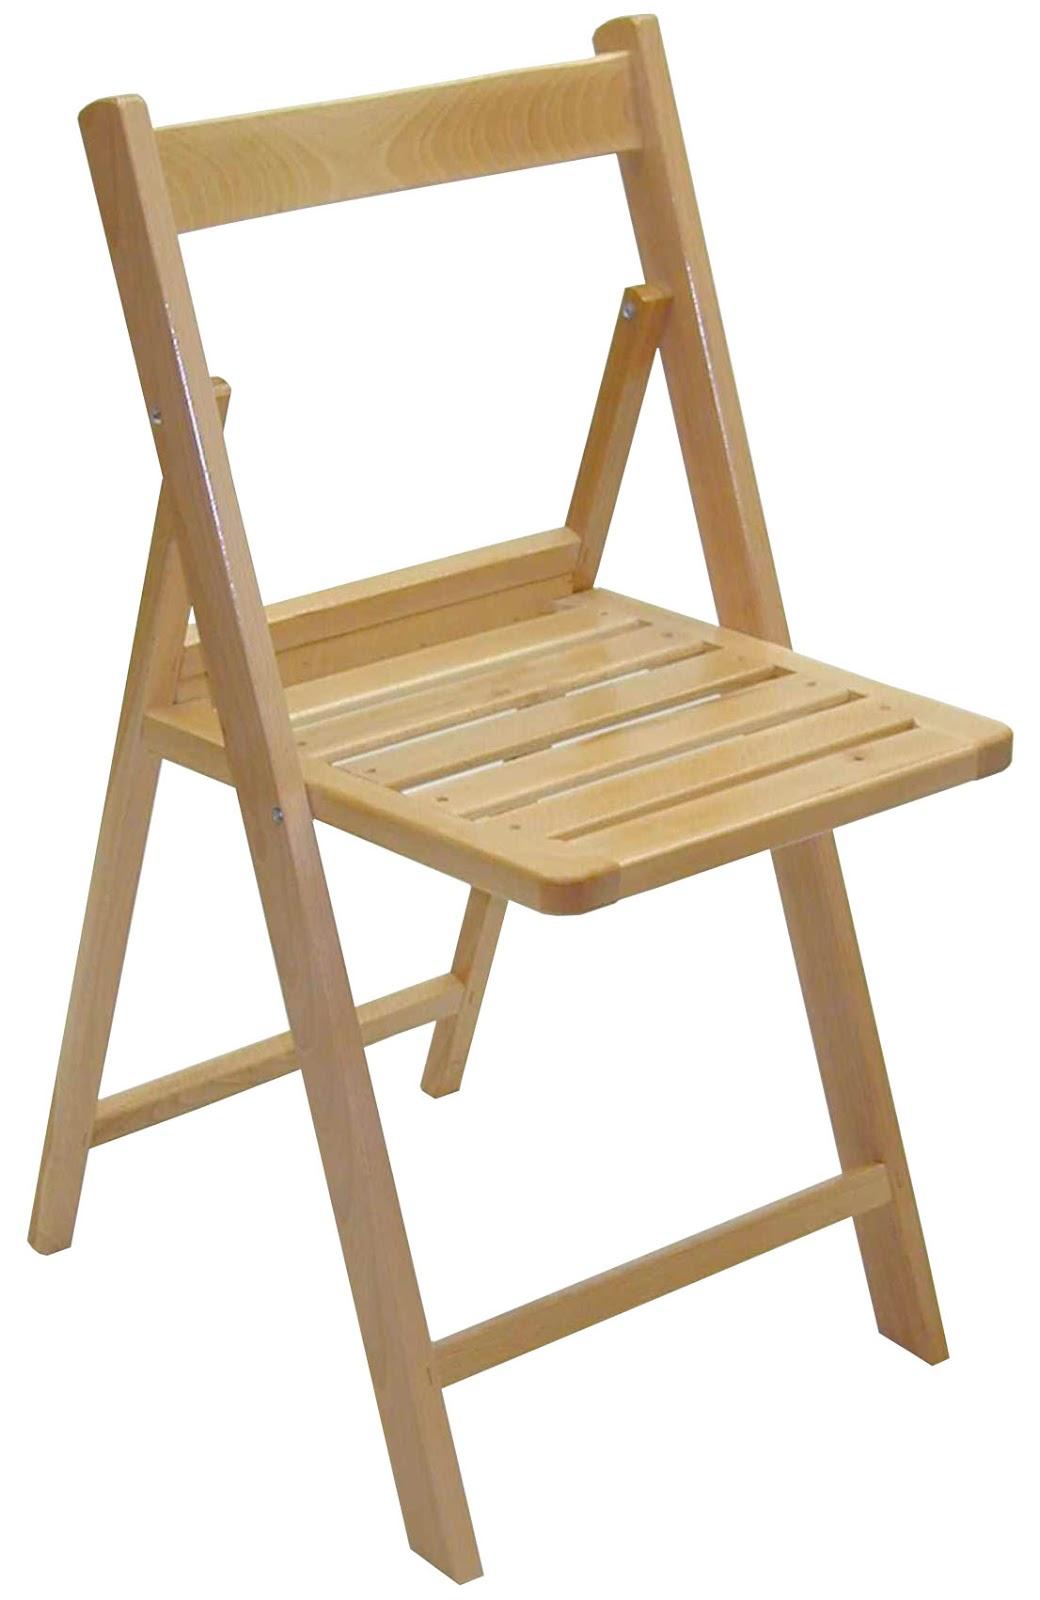 Docente bombal algunas sillas creativas de madera for Sillas madera